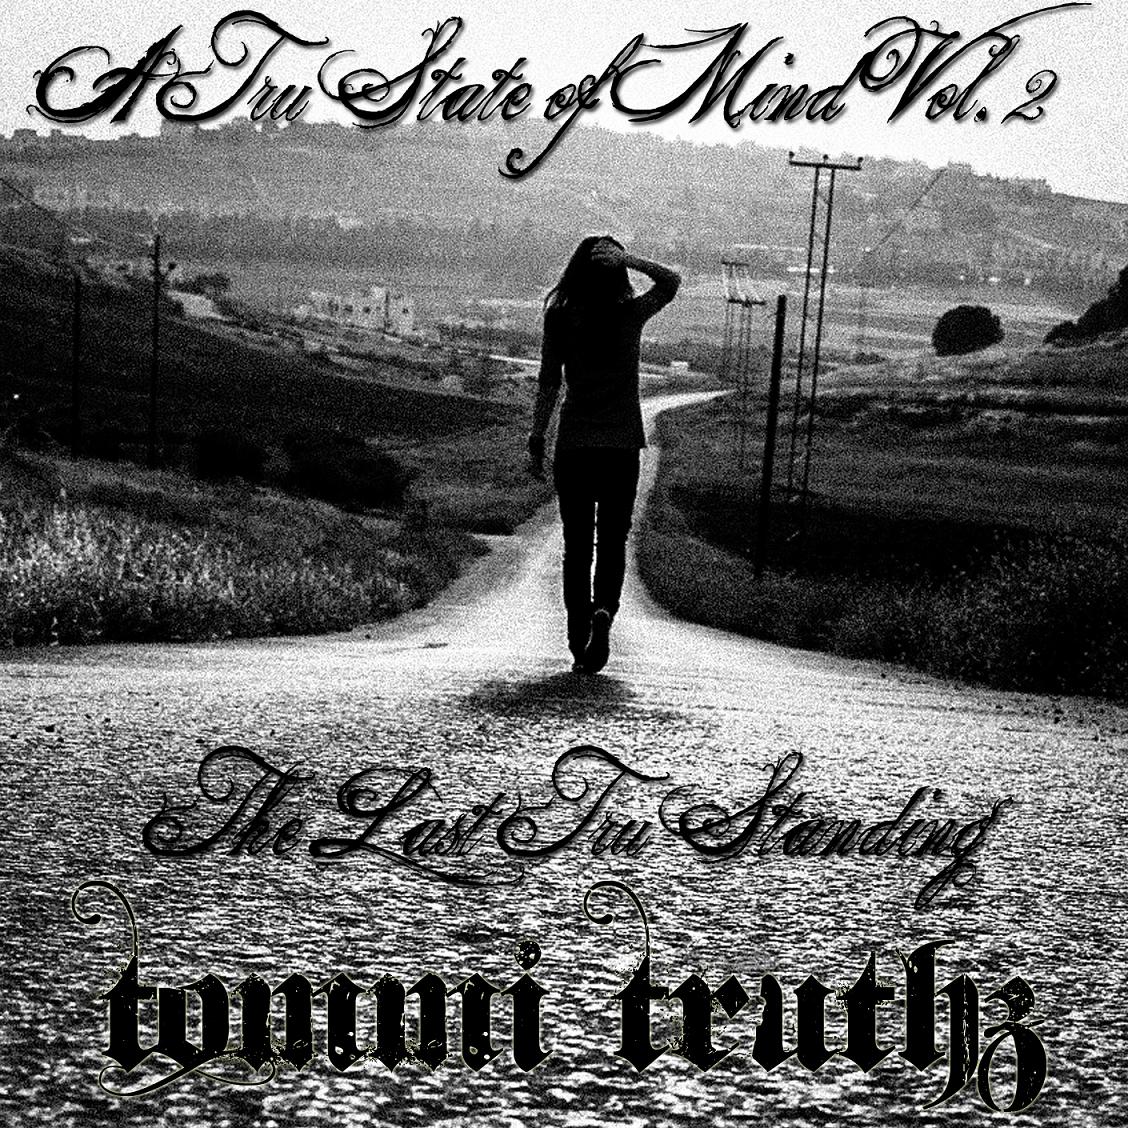 Released: 4-12-2012     Tommi Truthz // A Tru State of Mind Vol. II: The Last Tru Standing